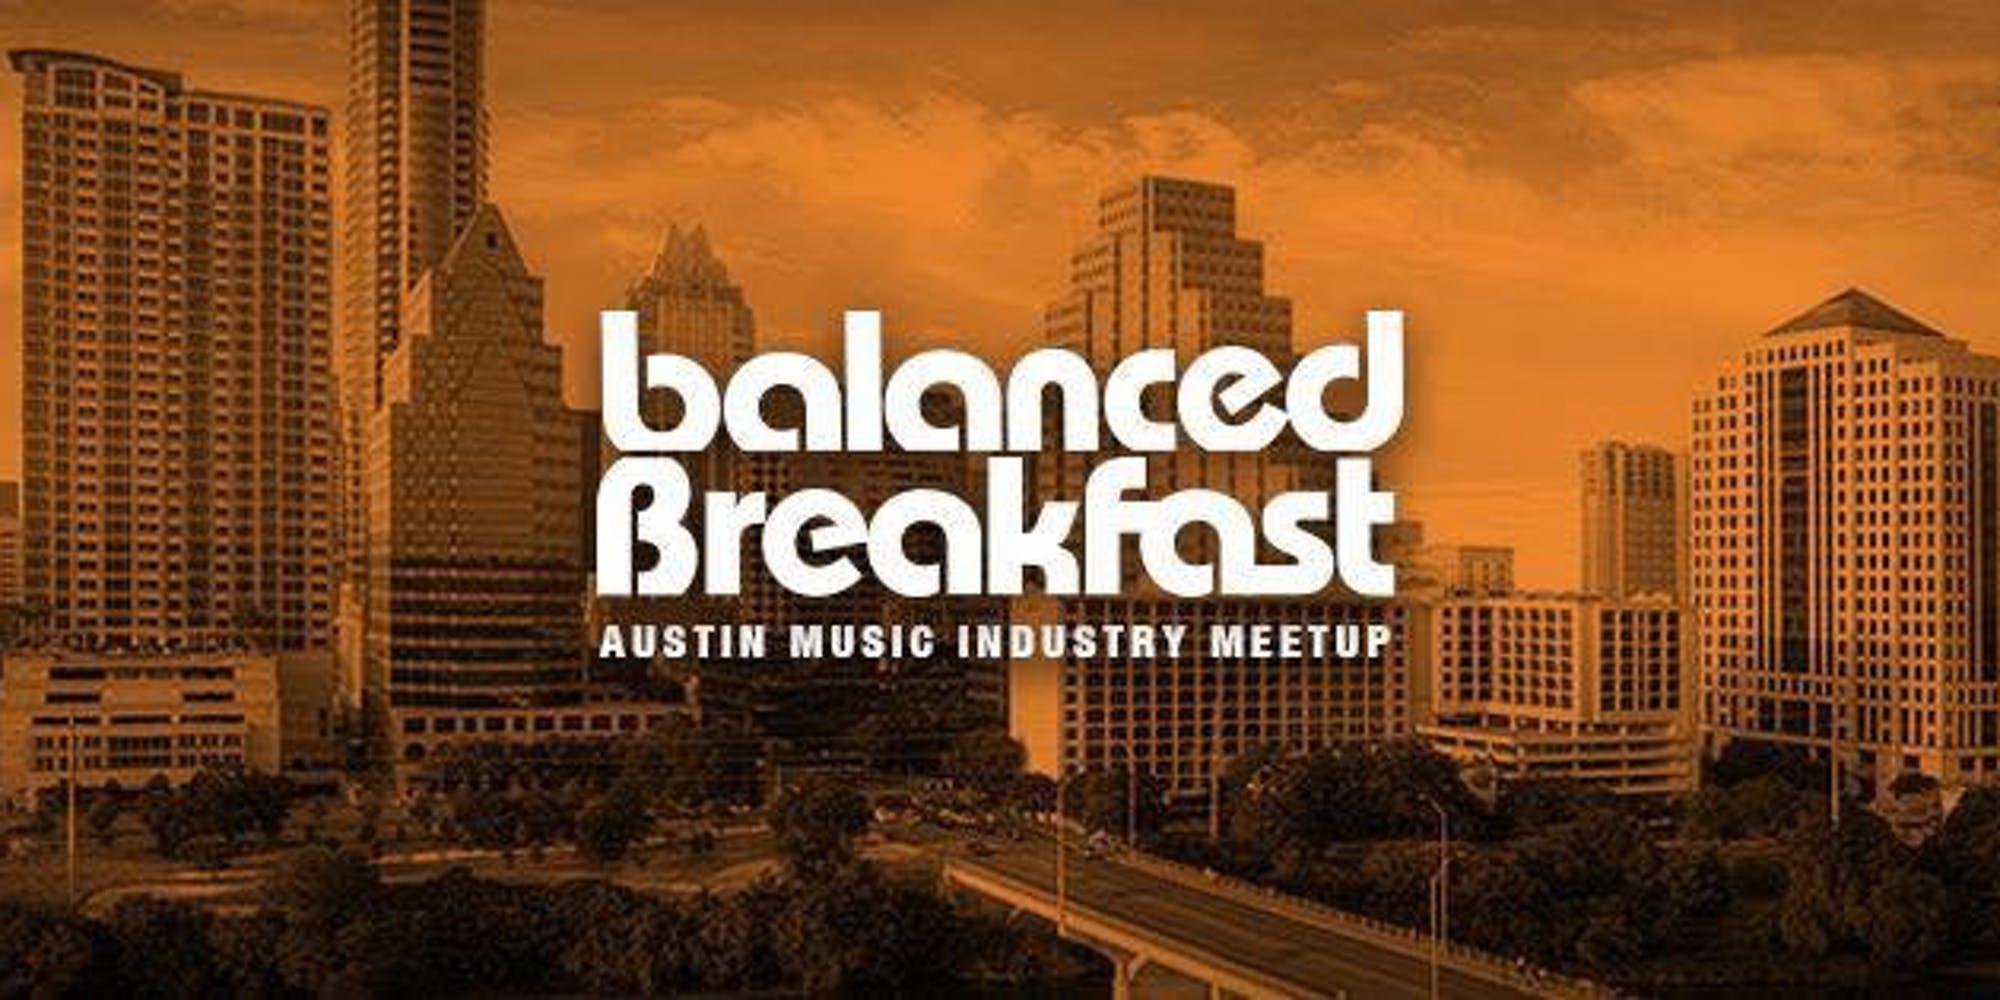 BB Austin Music Industry Meetup